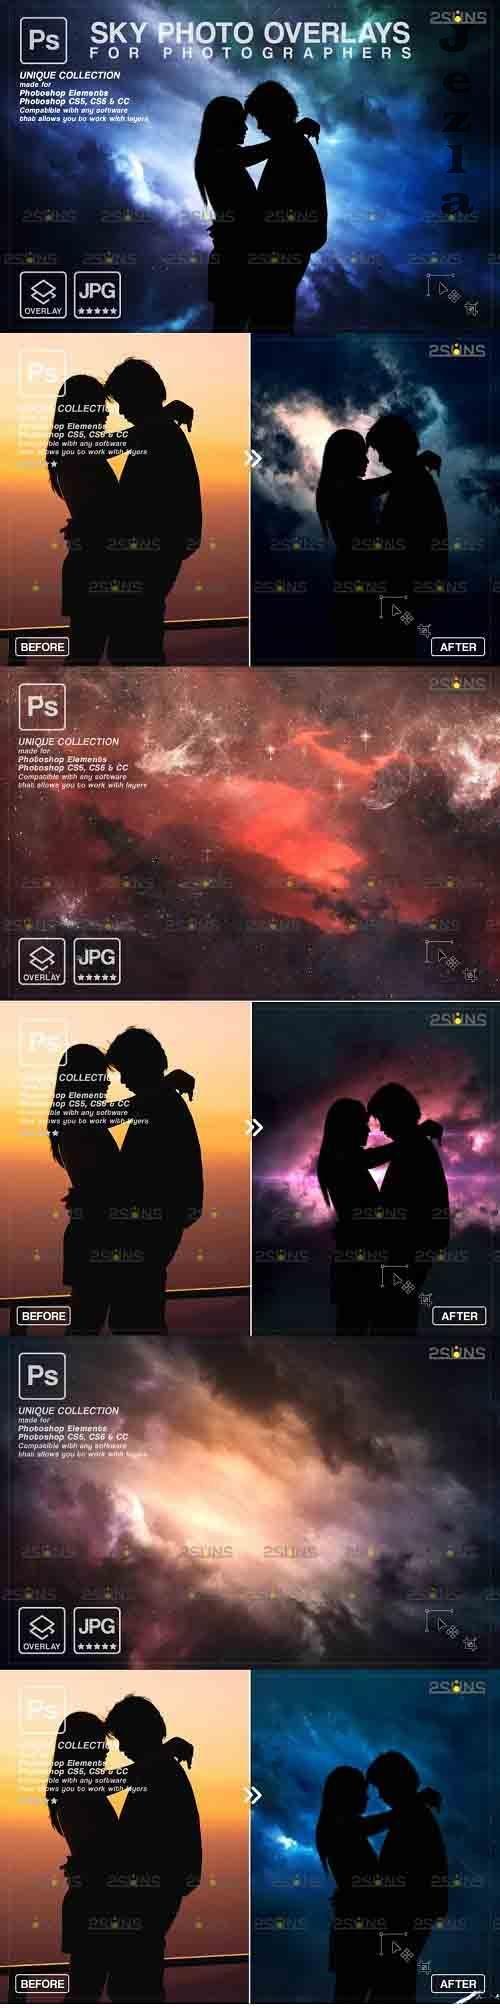 Night Sky Overlays, Pastel sky, sky overlay textures V3 - 1252018